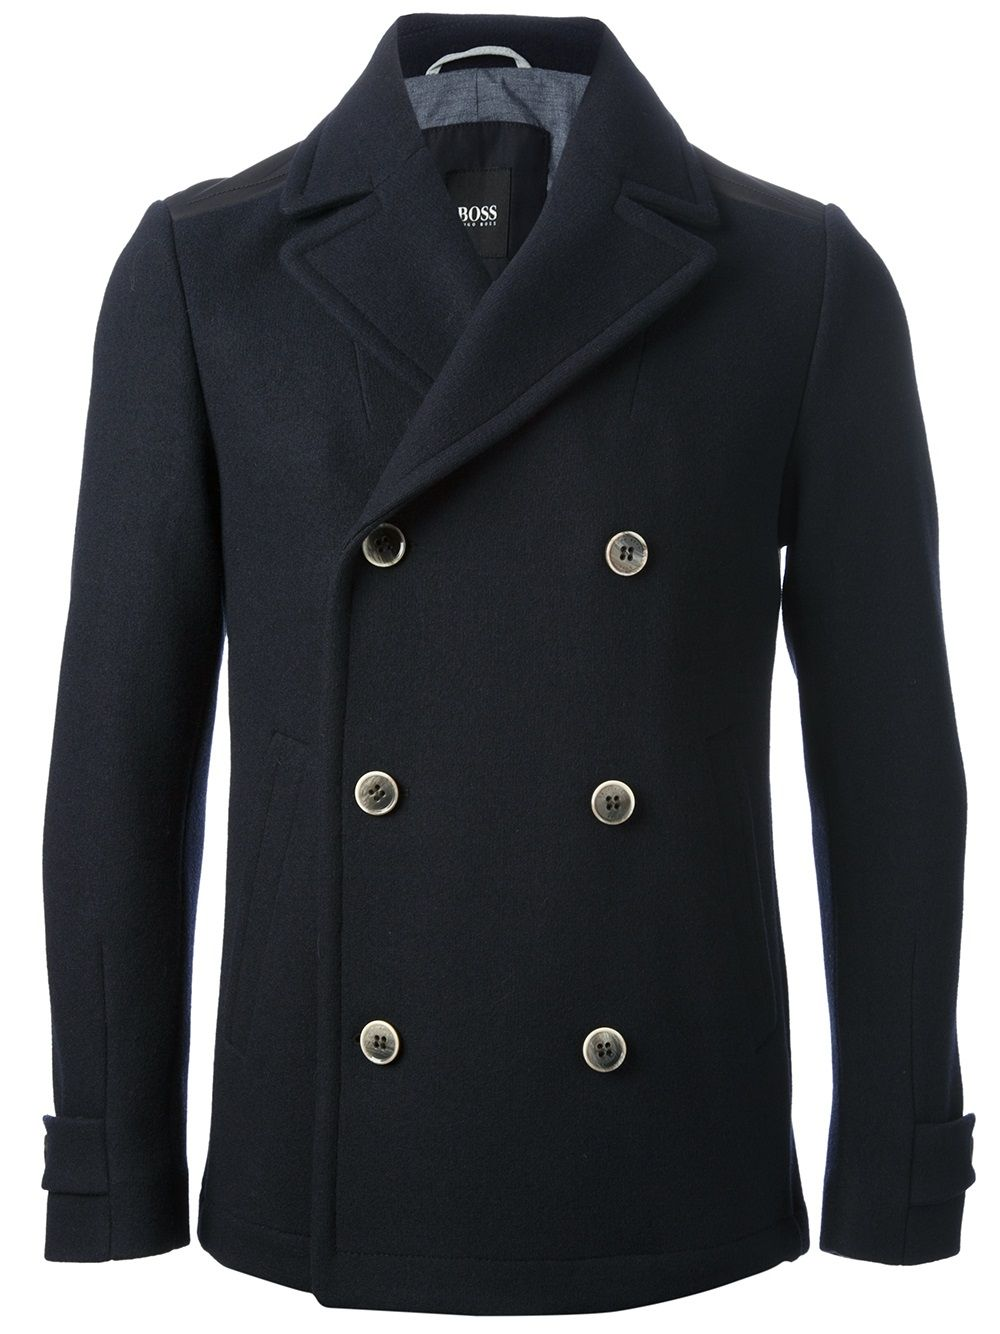 ef22da21e99 Hugo Boss Black Classic Pea Coat Boss Black, Just For Men, Fashion Updates,